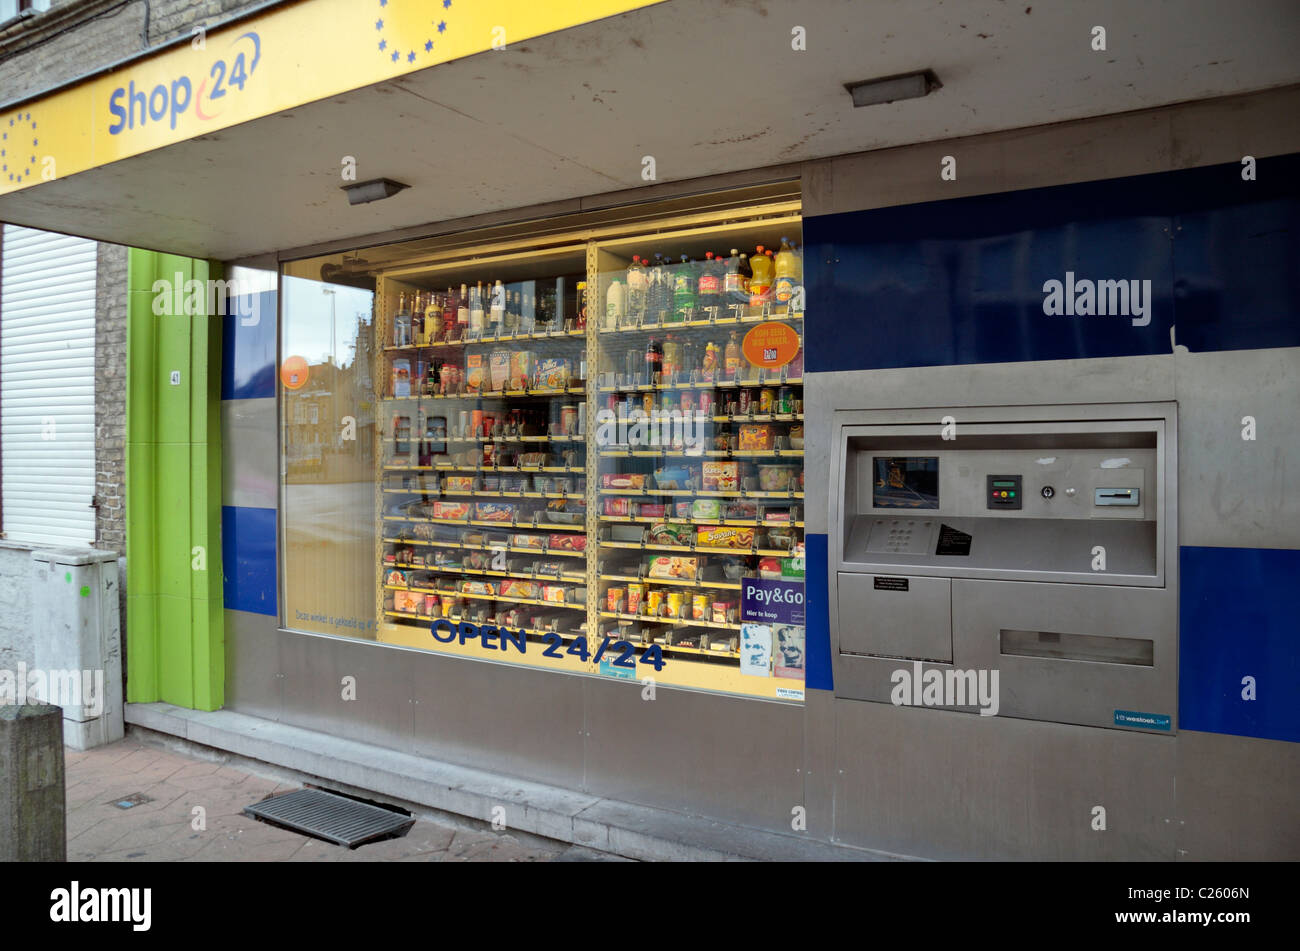 shop 24 vending machine